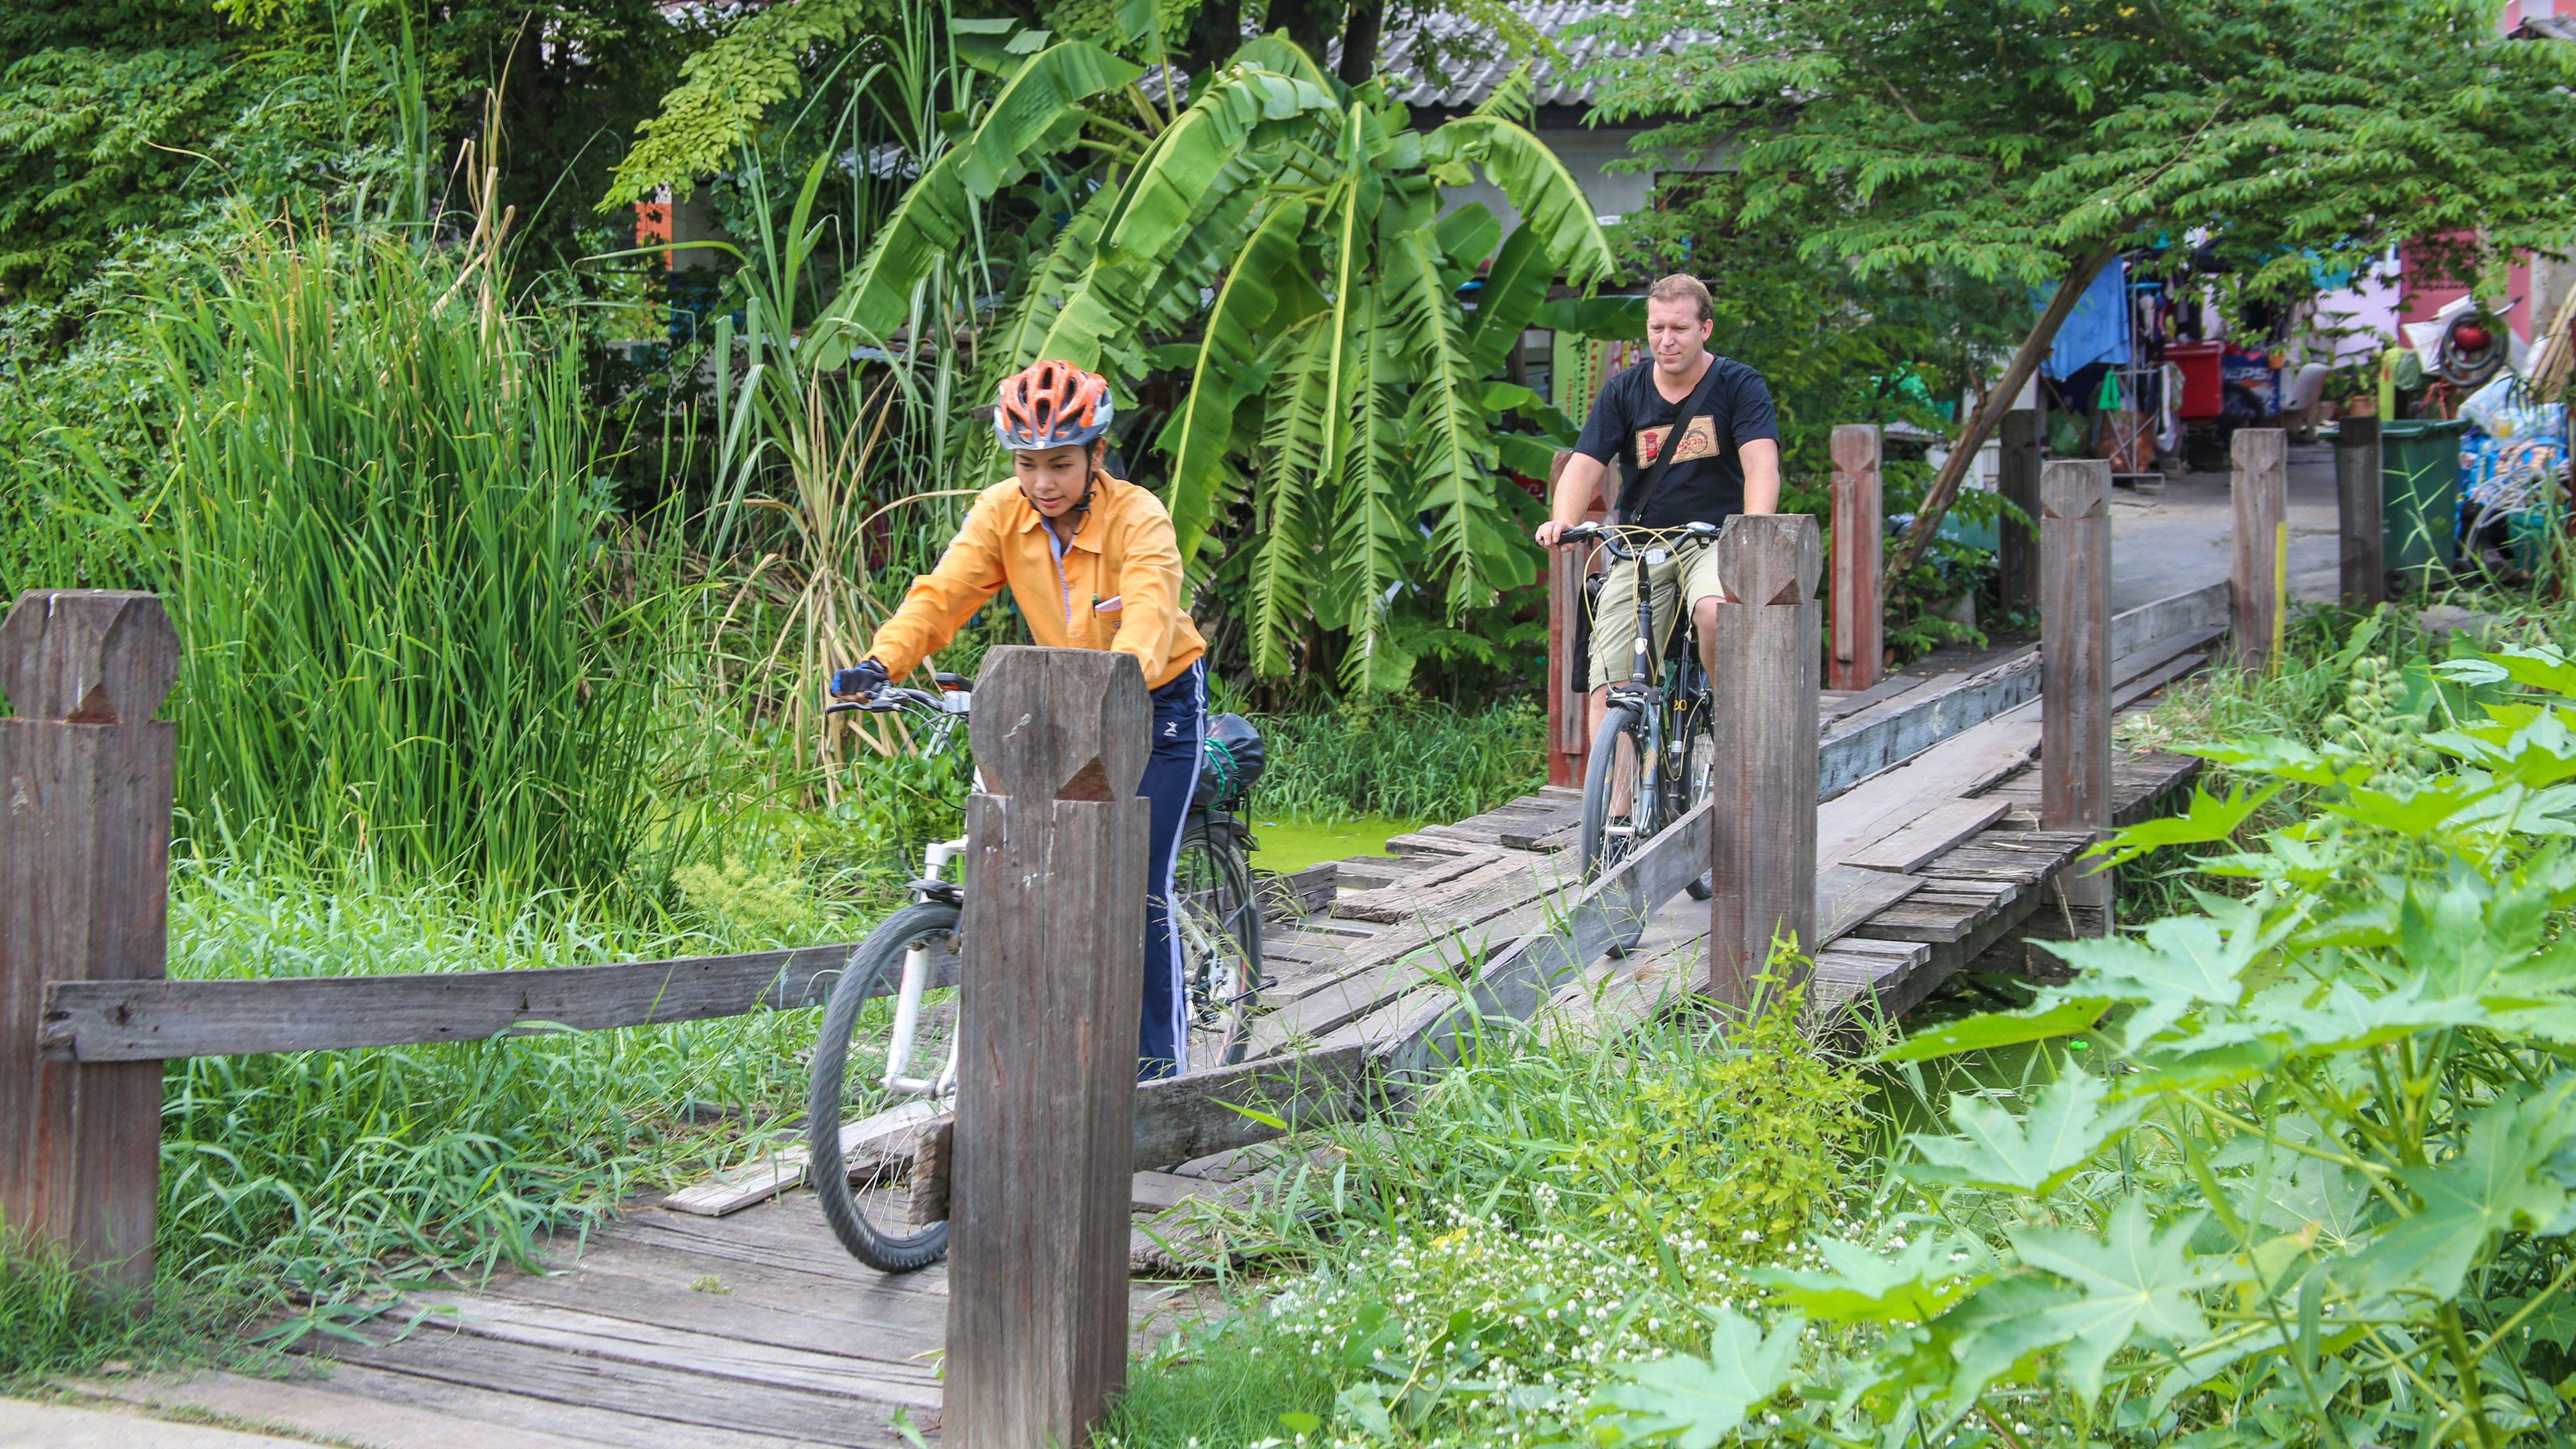 Ayutthaya City Culture Ride - ancient city's historical park